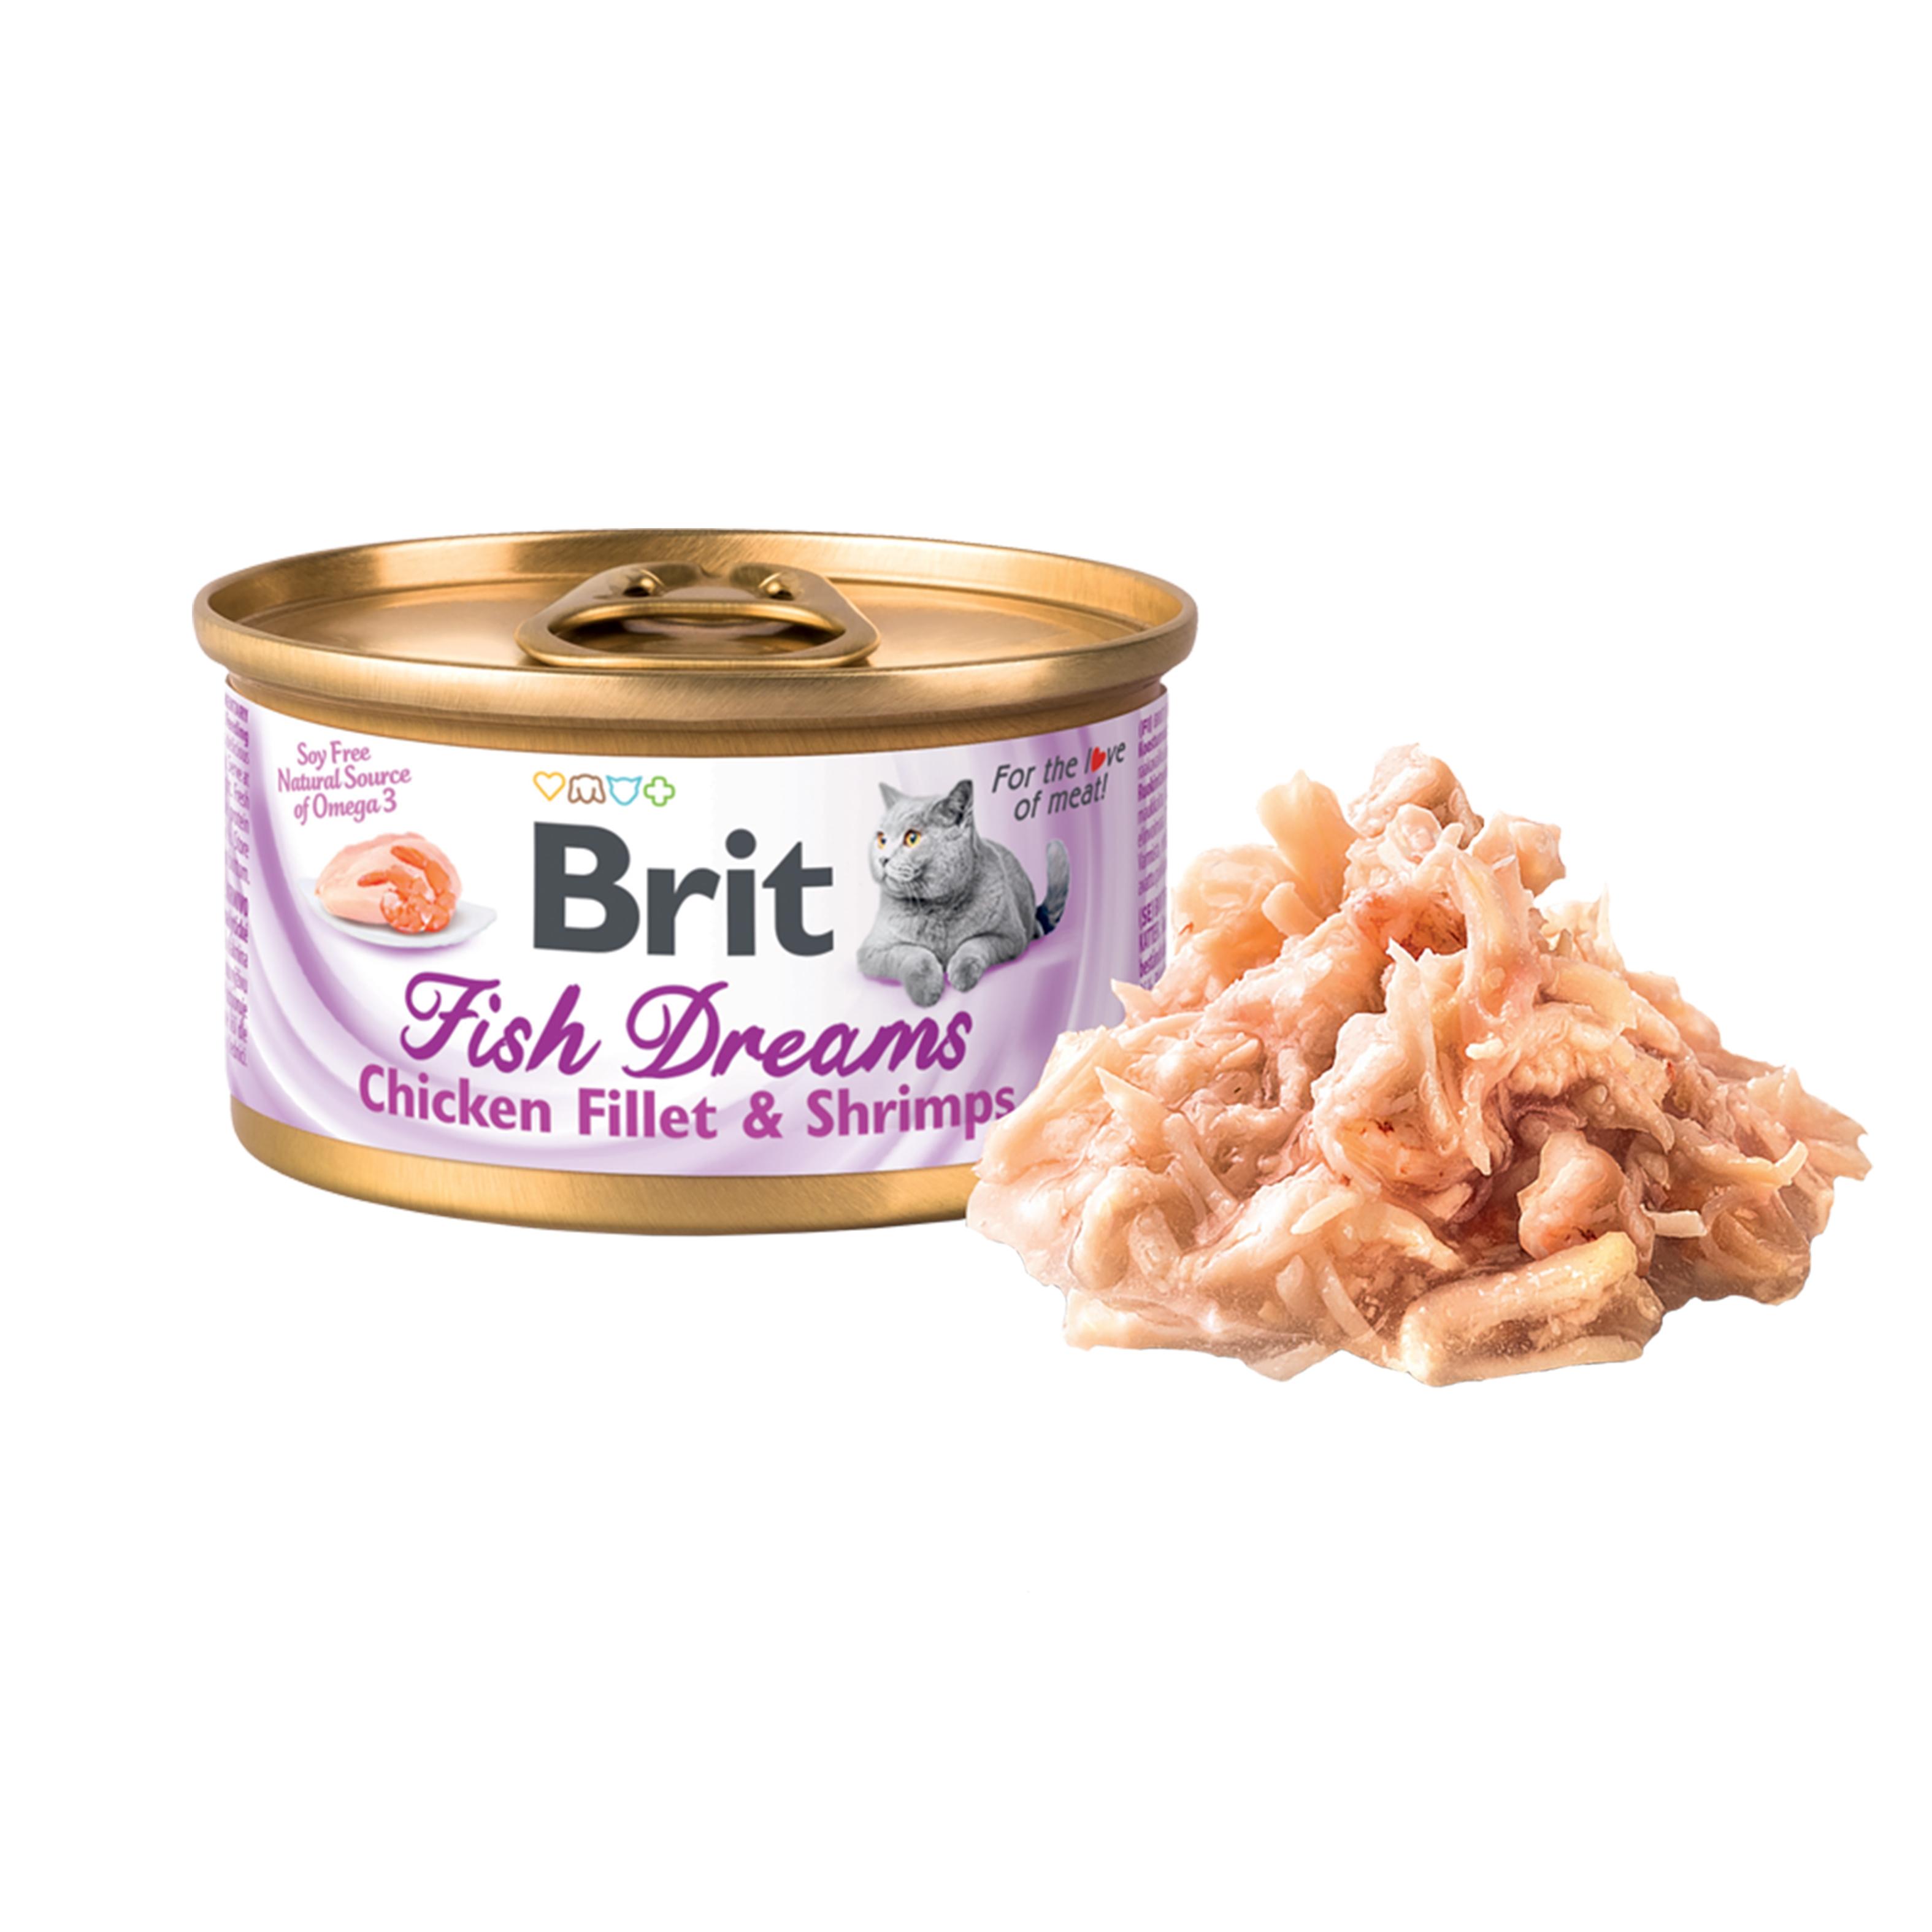 Brit Fish Dreams Chicken Fillet and Shrimps, 80 g imagine